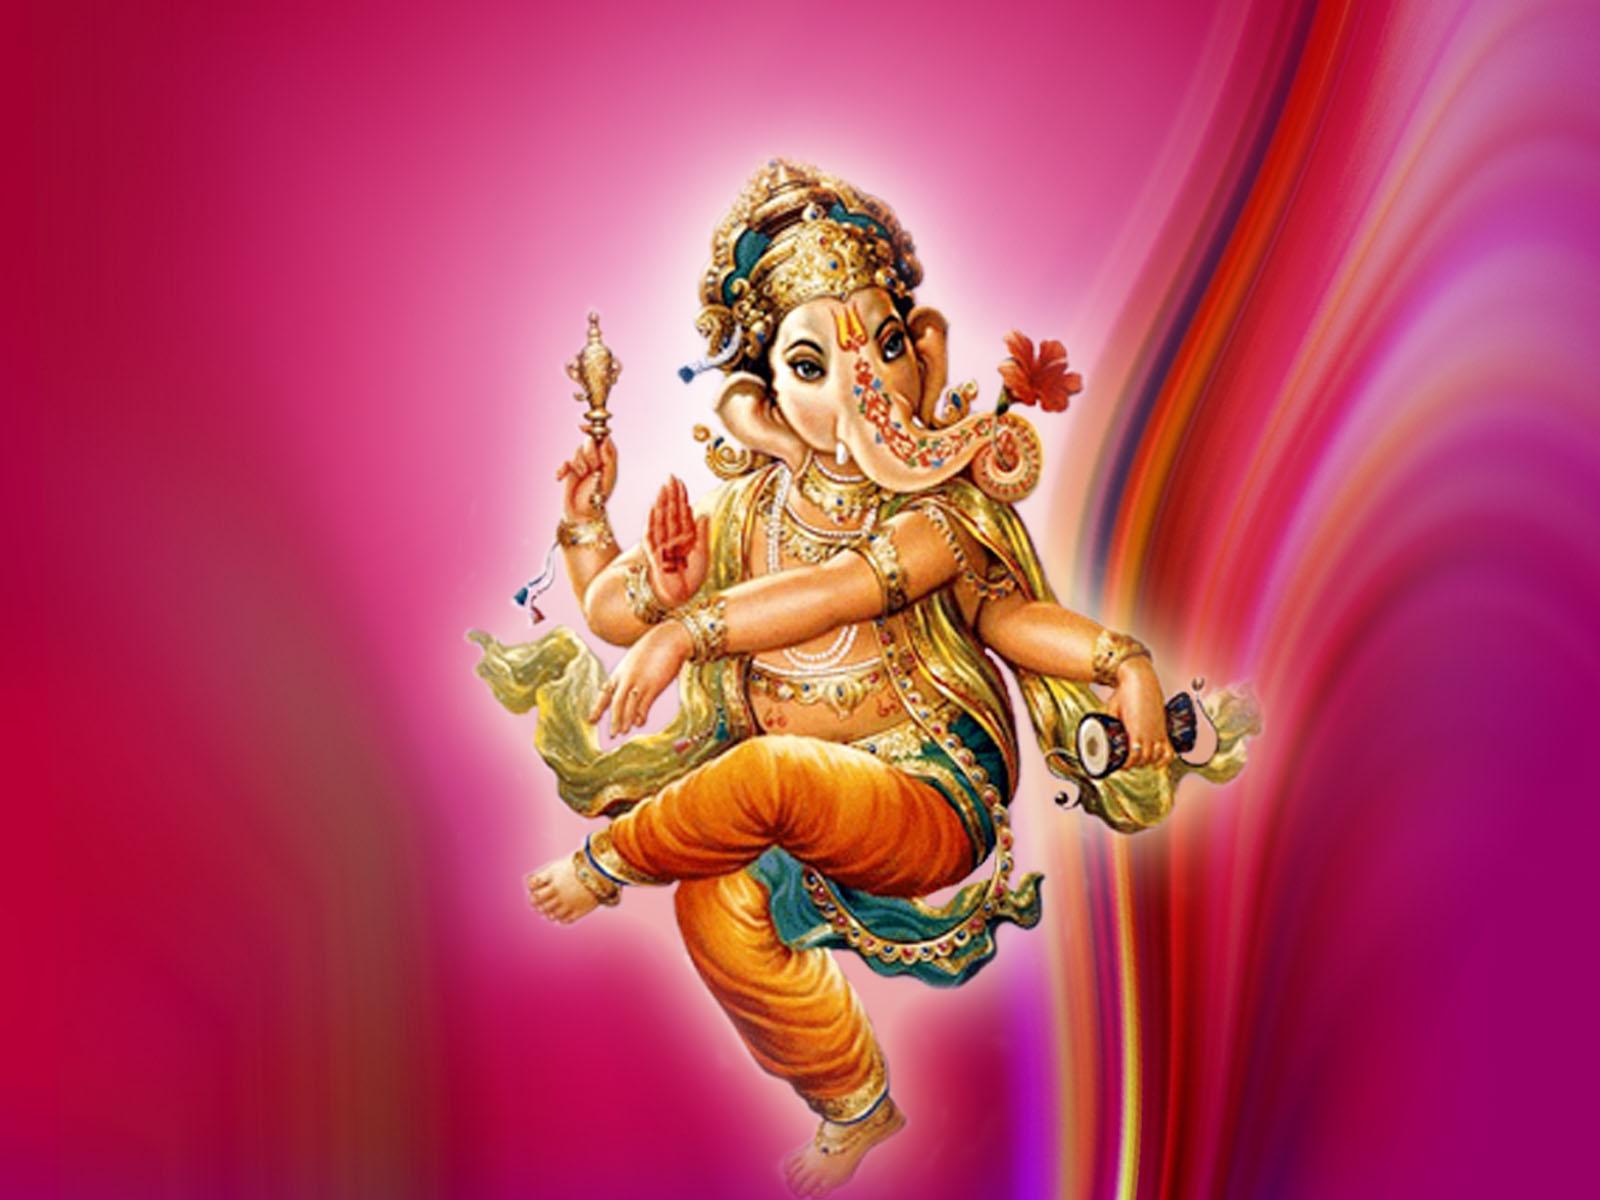 Vinayaka Chavithi Hd Wallpapers Free Ganesha Download Free Clip Art Free Clip Art On